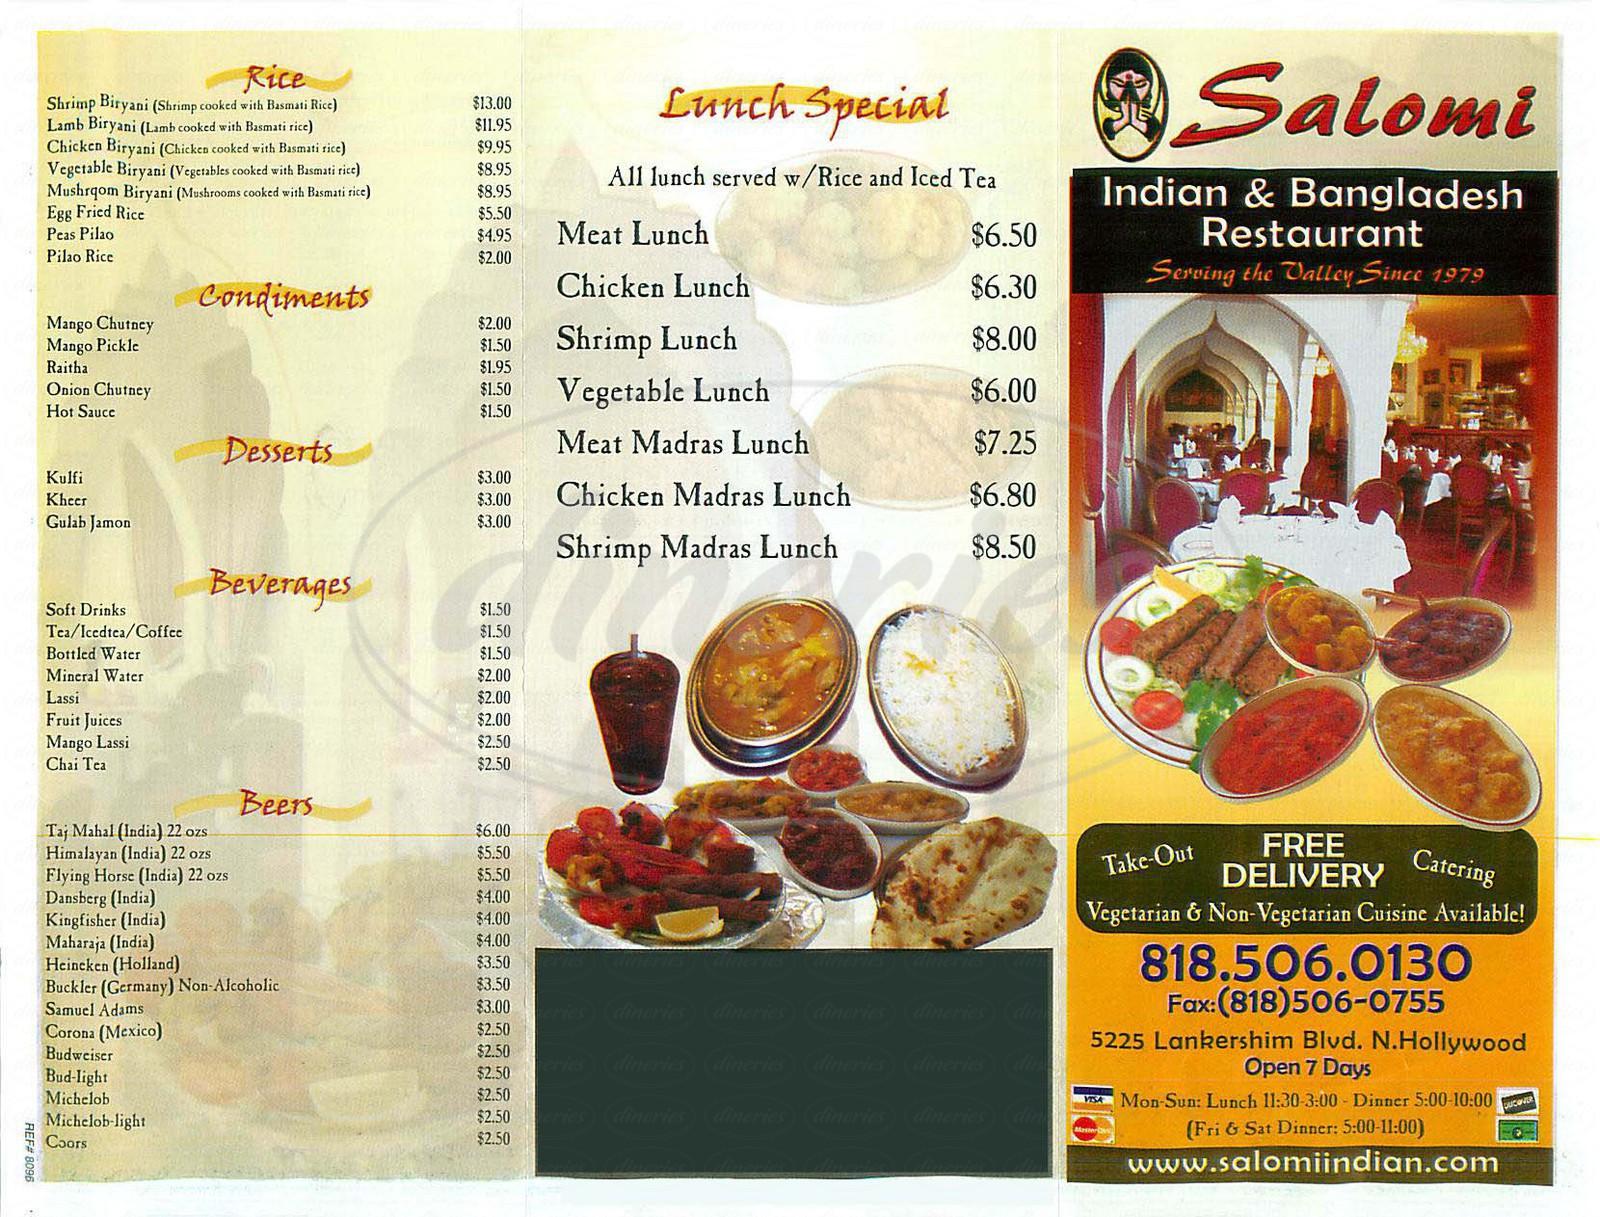 menu for Salomi Indian & Bangladesh Restaurant